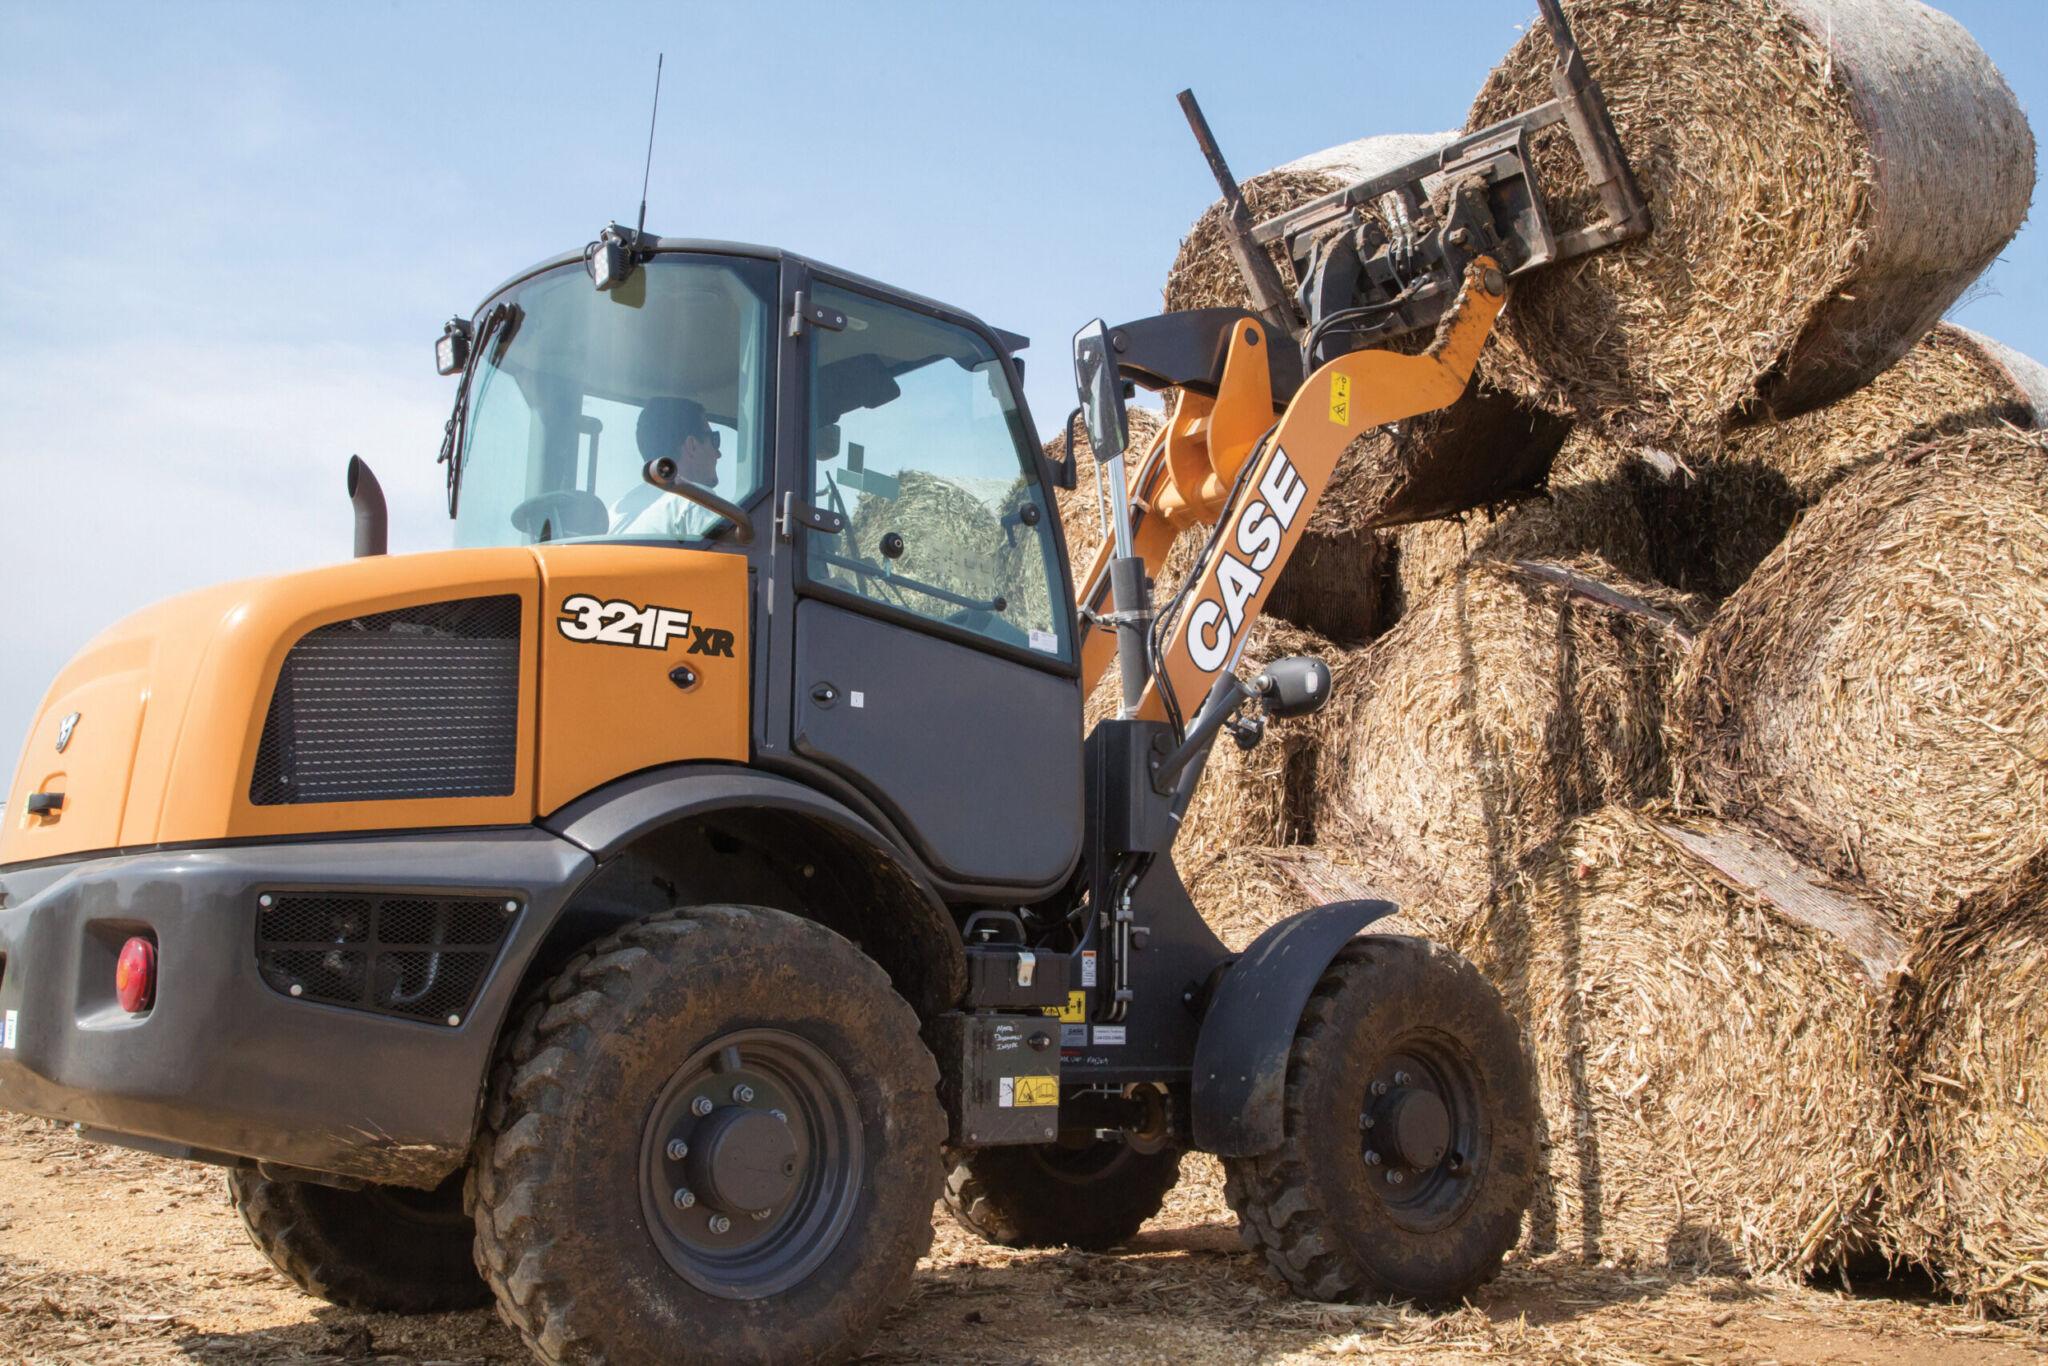 Case CE Radlader 321F|copyright: Case Construction Equipment